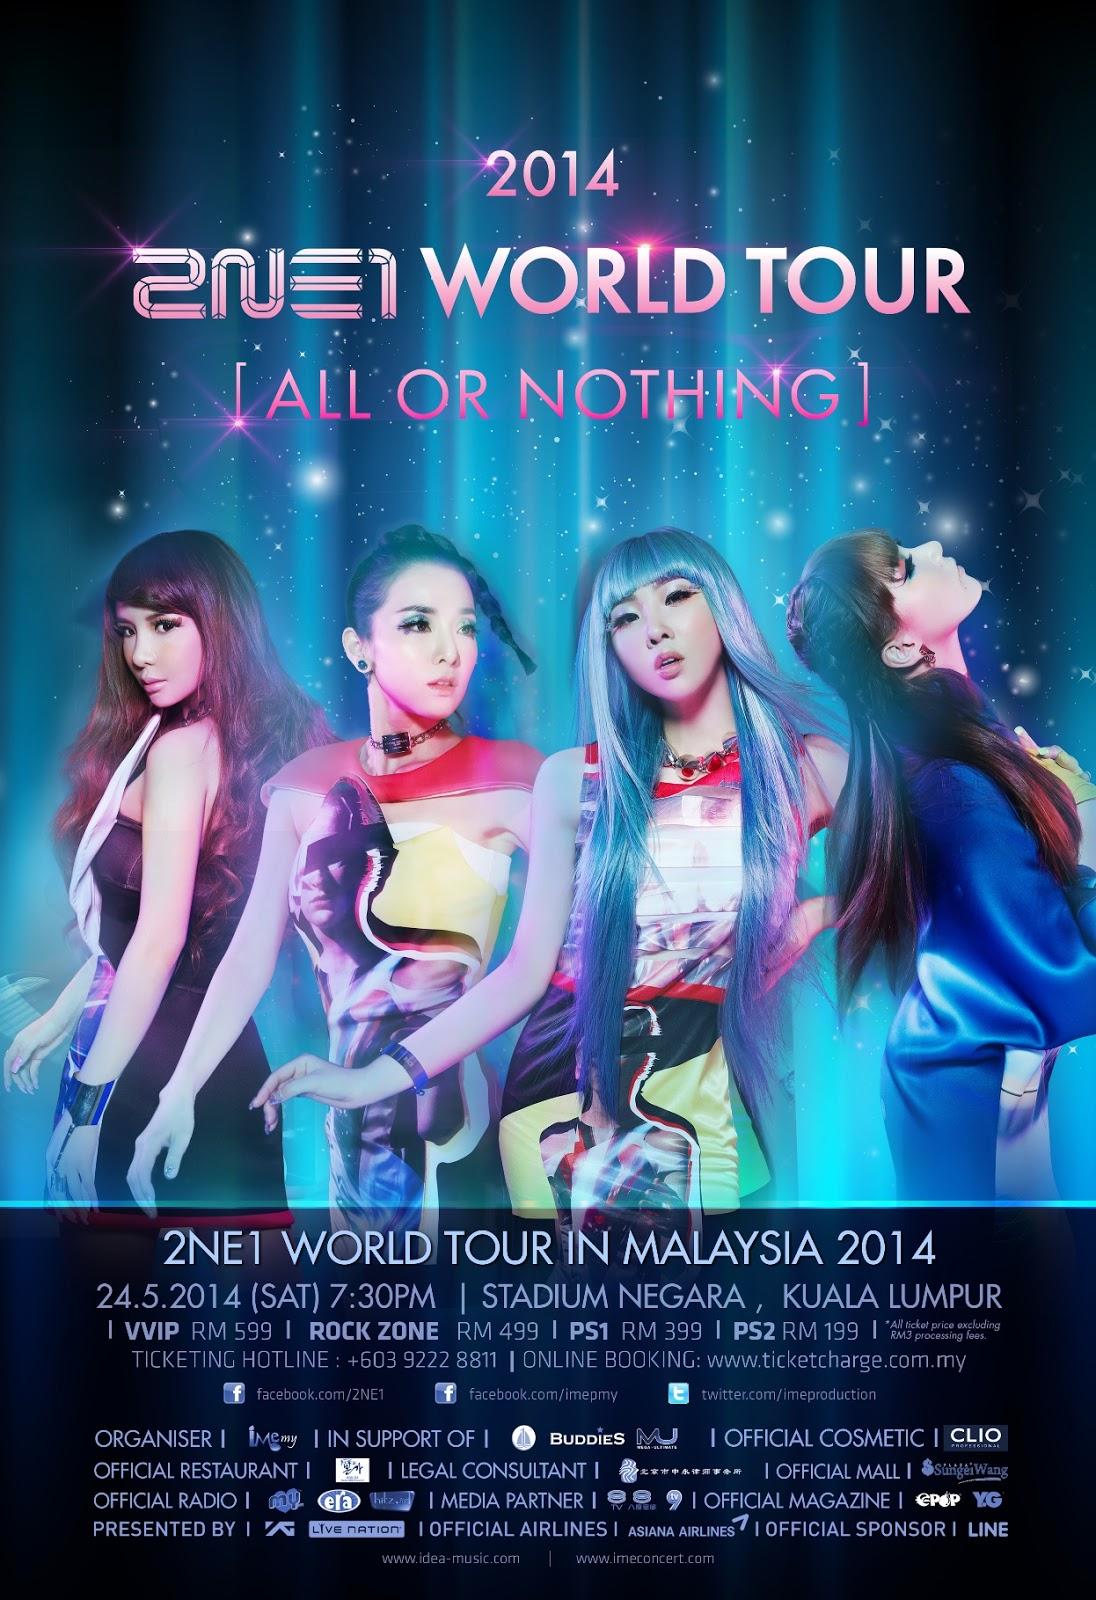 2ne1, malaysia, stadium negara, konsert, mei, tiket, CL, MBTD